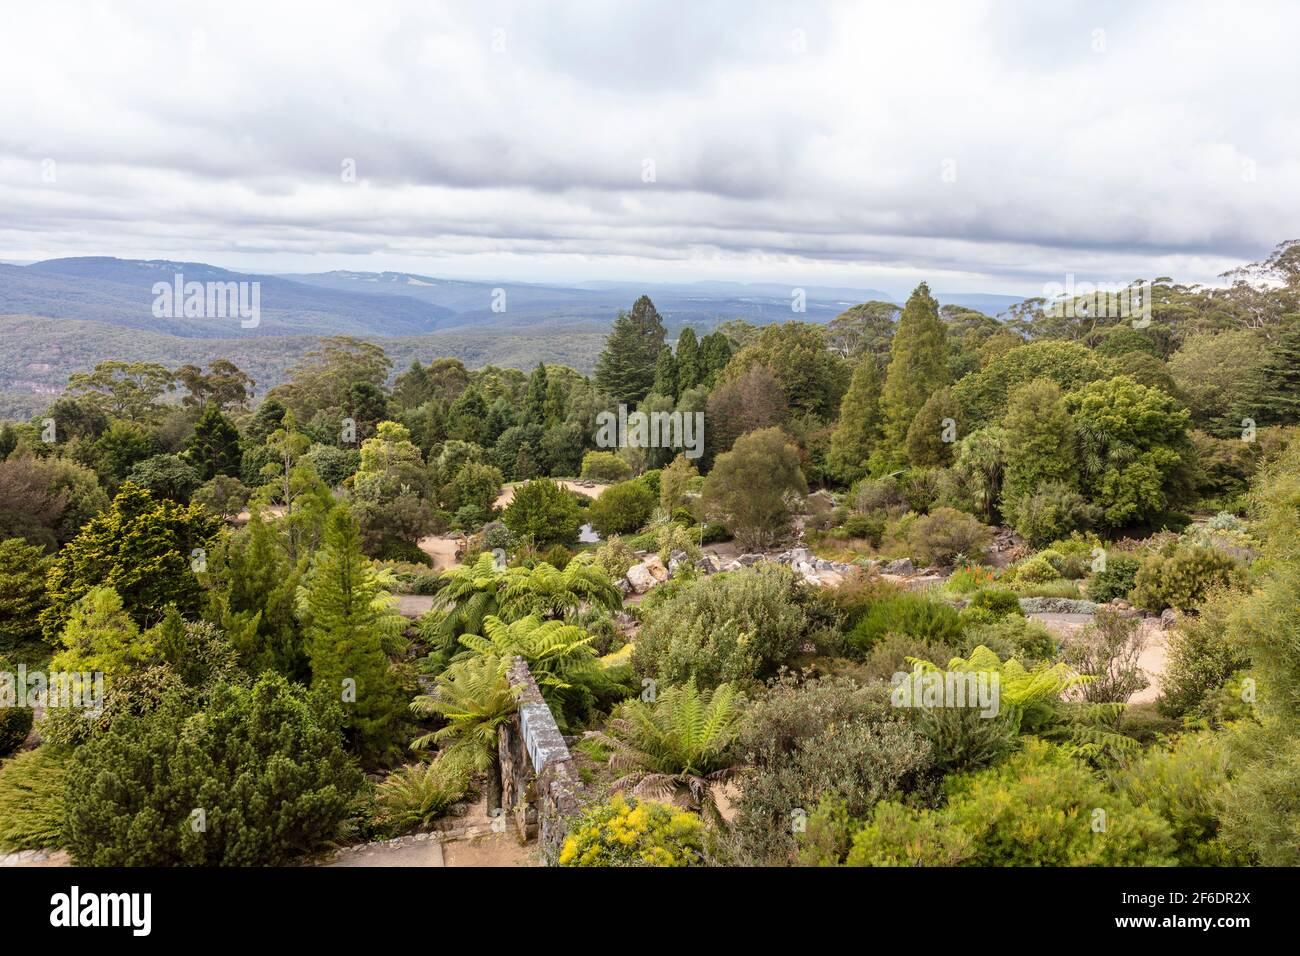 Scenic view of the the Blue Mountains at the Botanic Garden near Sydney, Australia. Stock Photo